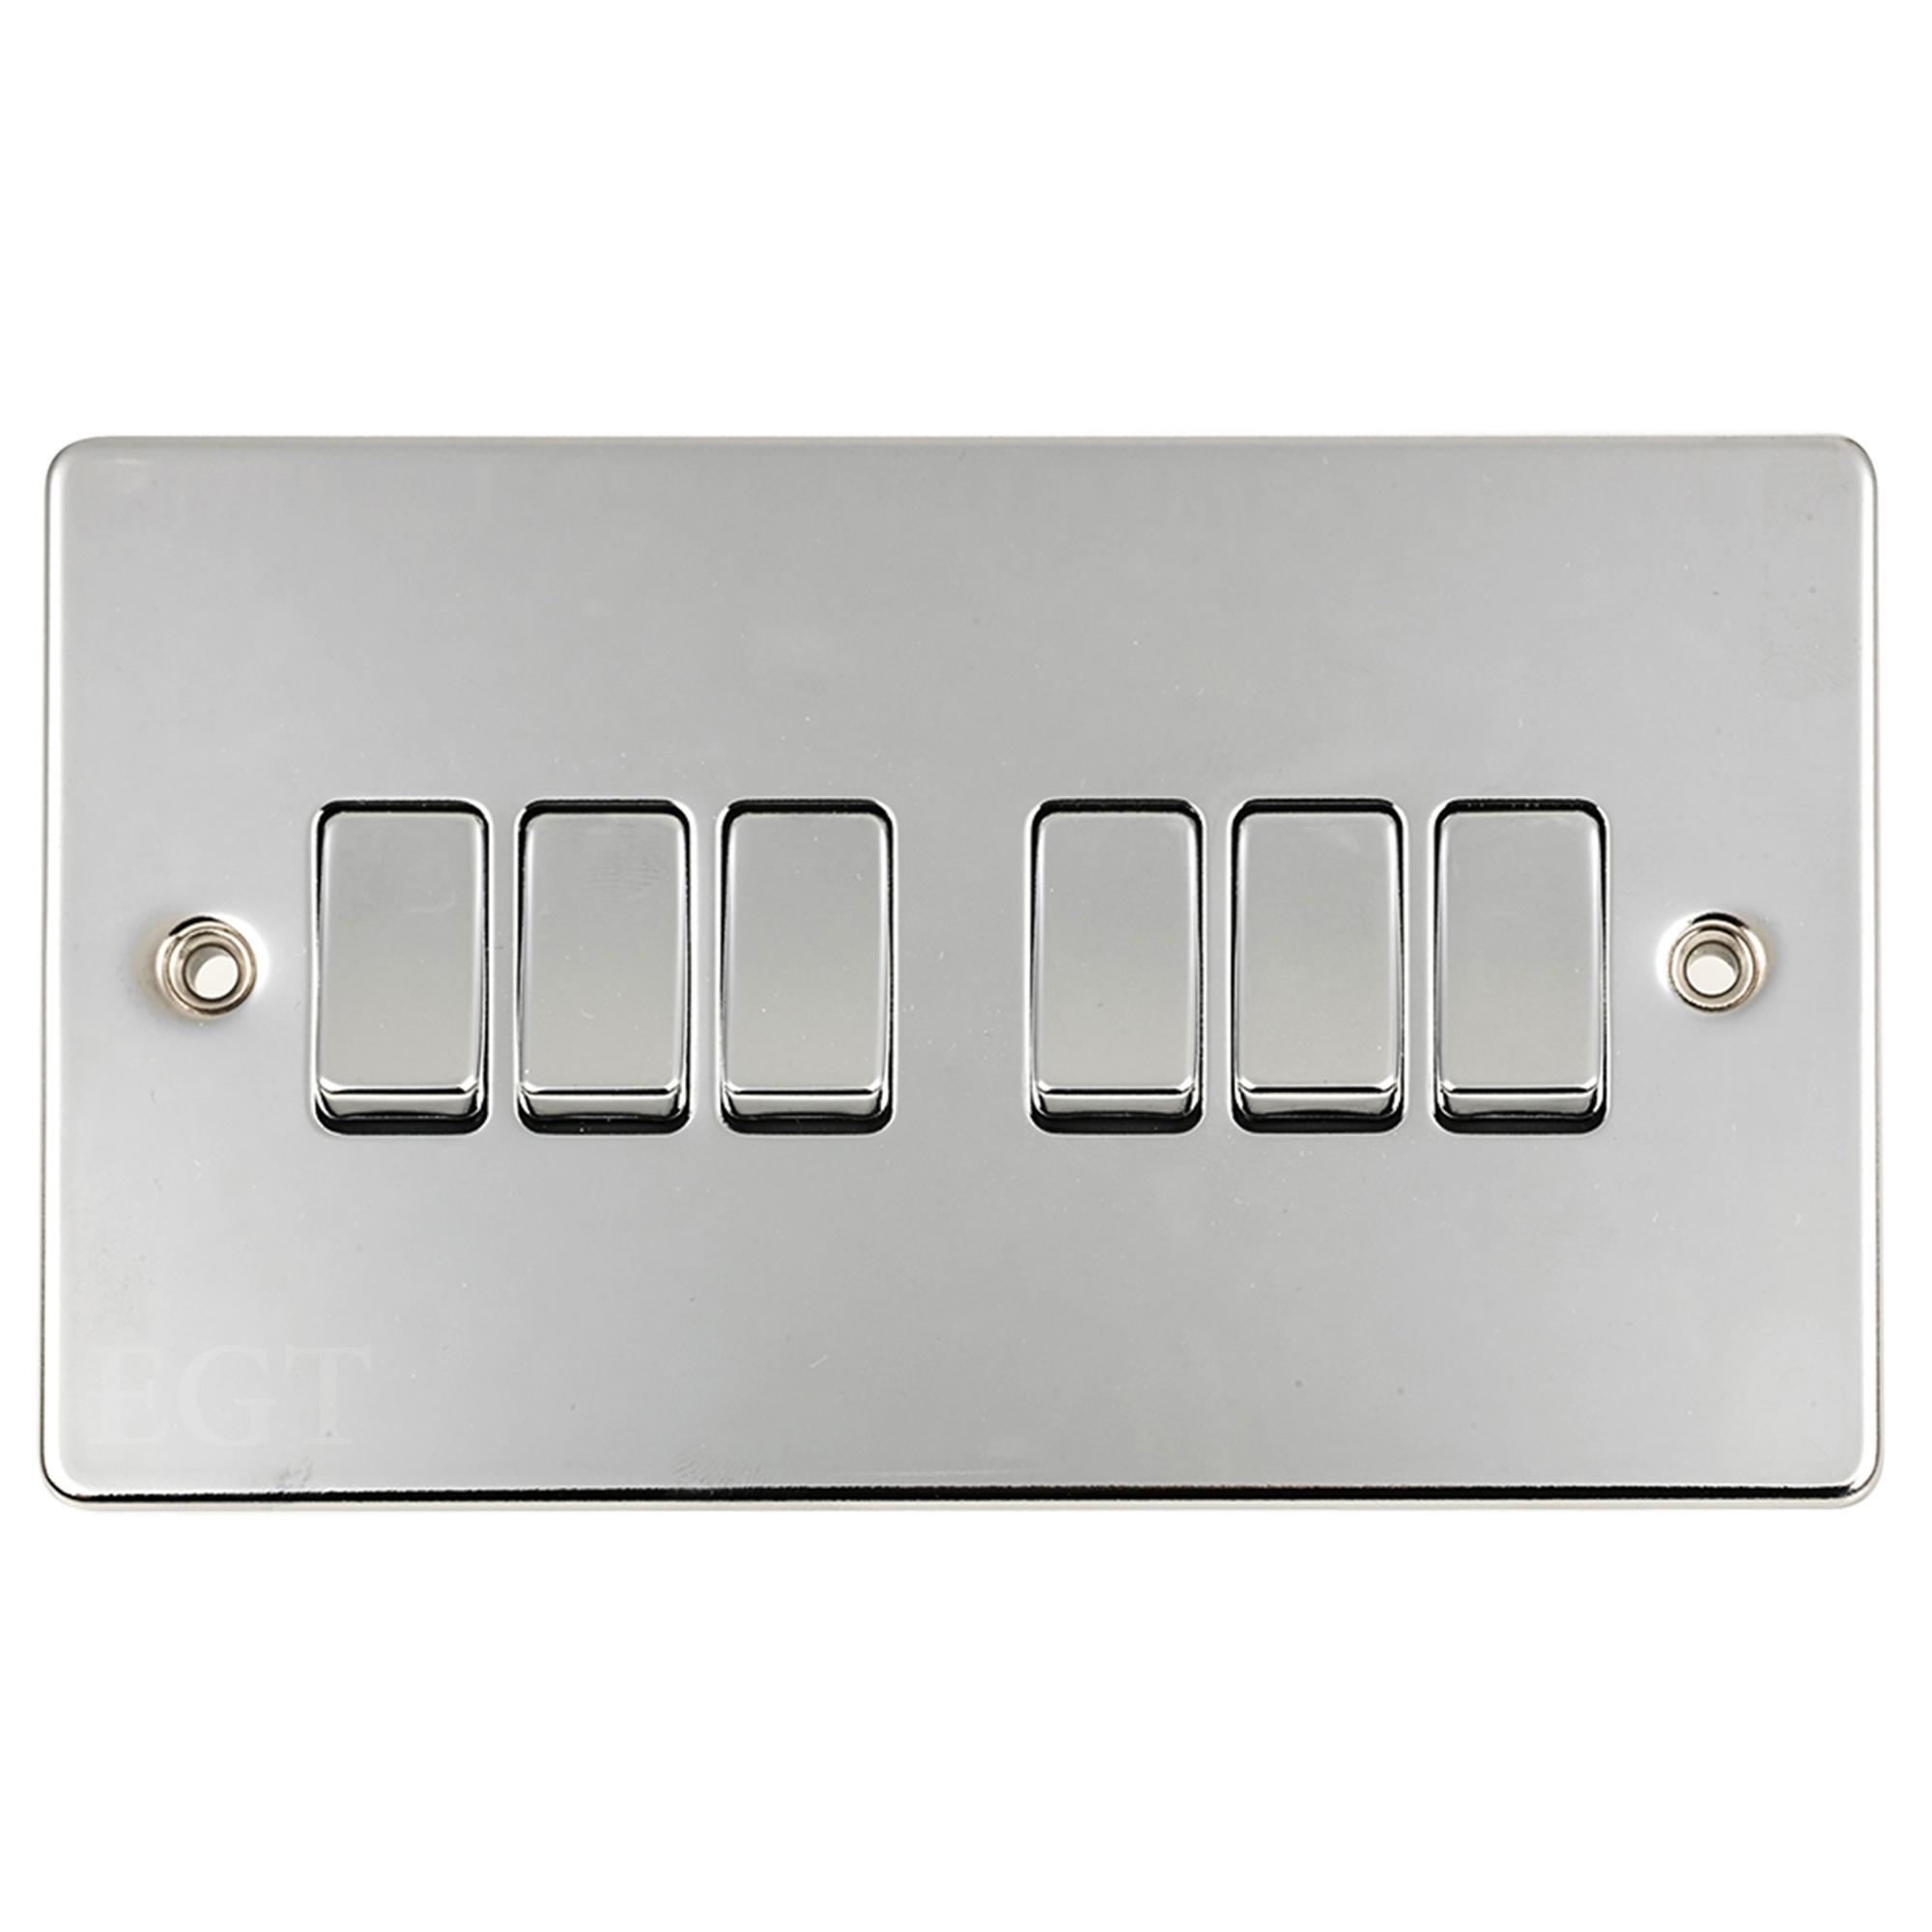 Uncategorized Grid Switches For Kitchen Appliances Jamesmcavoybr 2 Way Retractive Switch Ebay Simplicity Screwless Stylish Plastic White Range Light Plug Sockets Etc